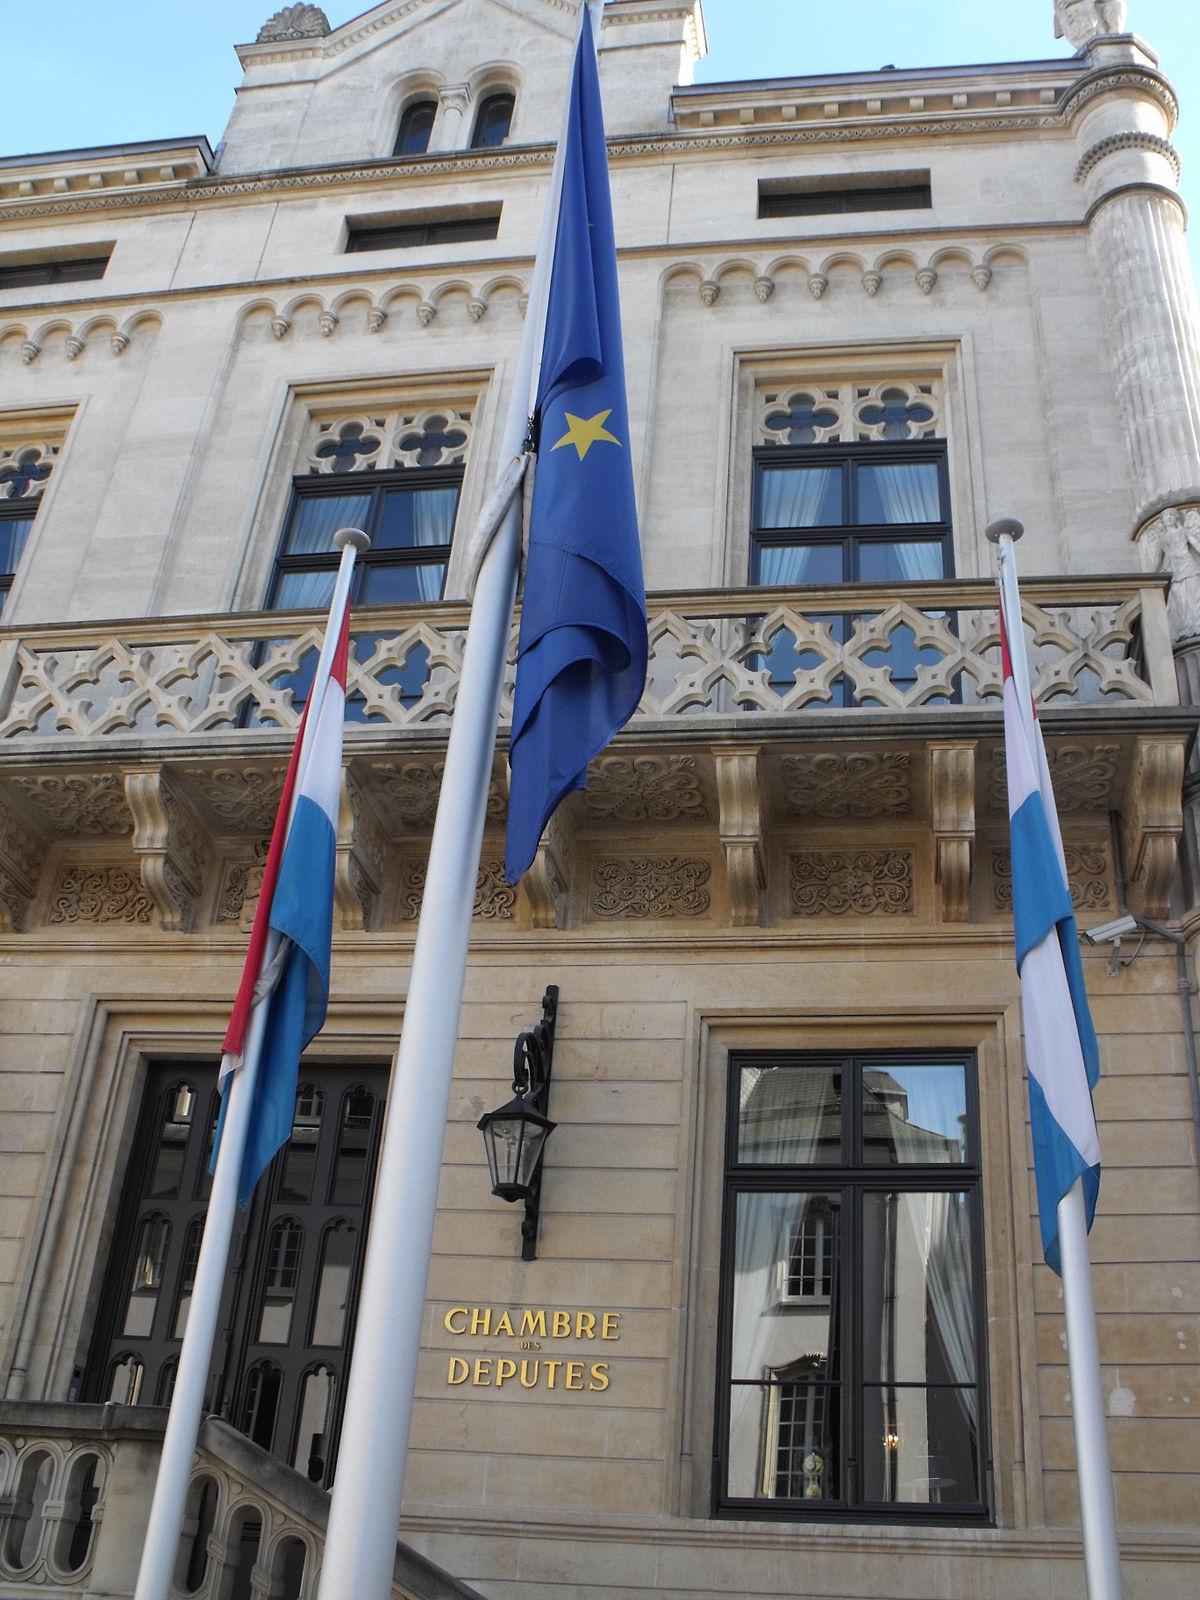 gratuit dating luxembursko seznamky s atlantickou kanadou